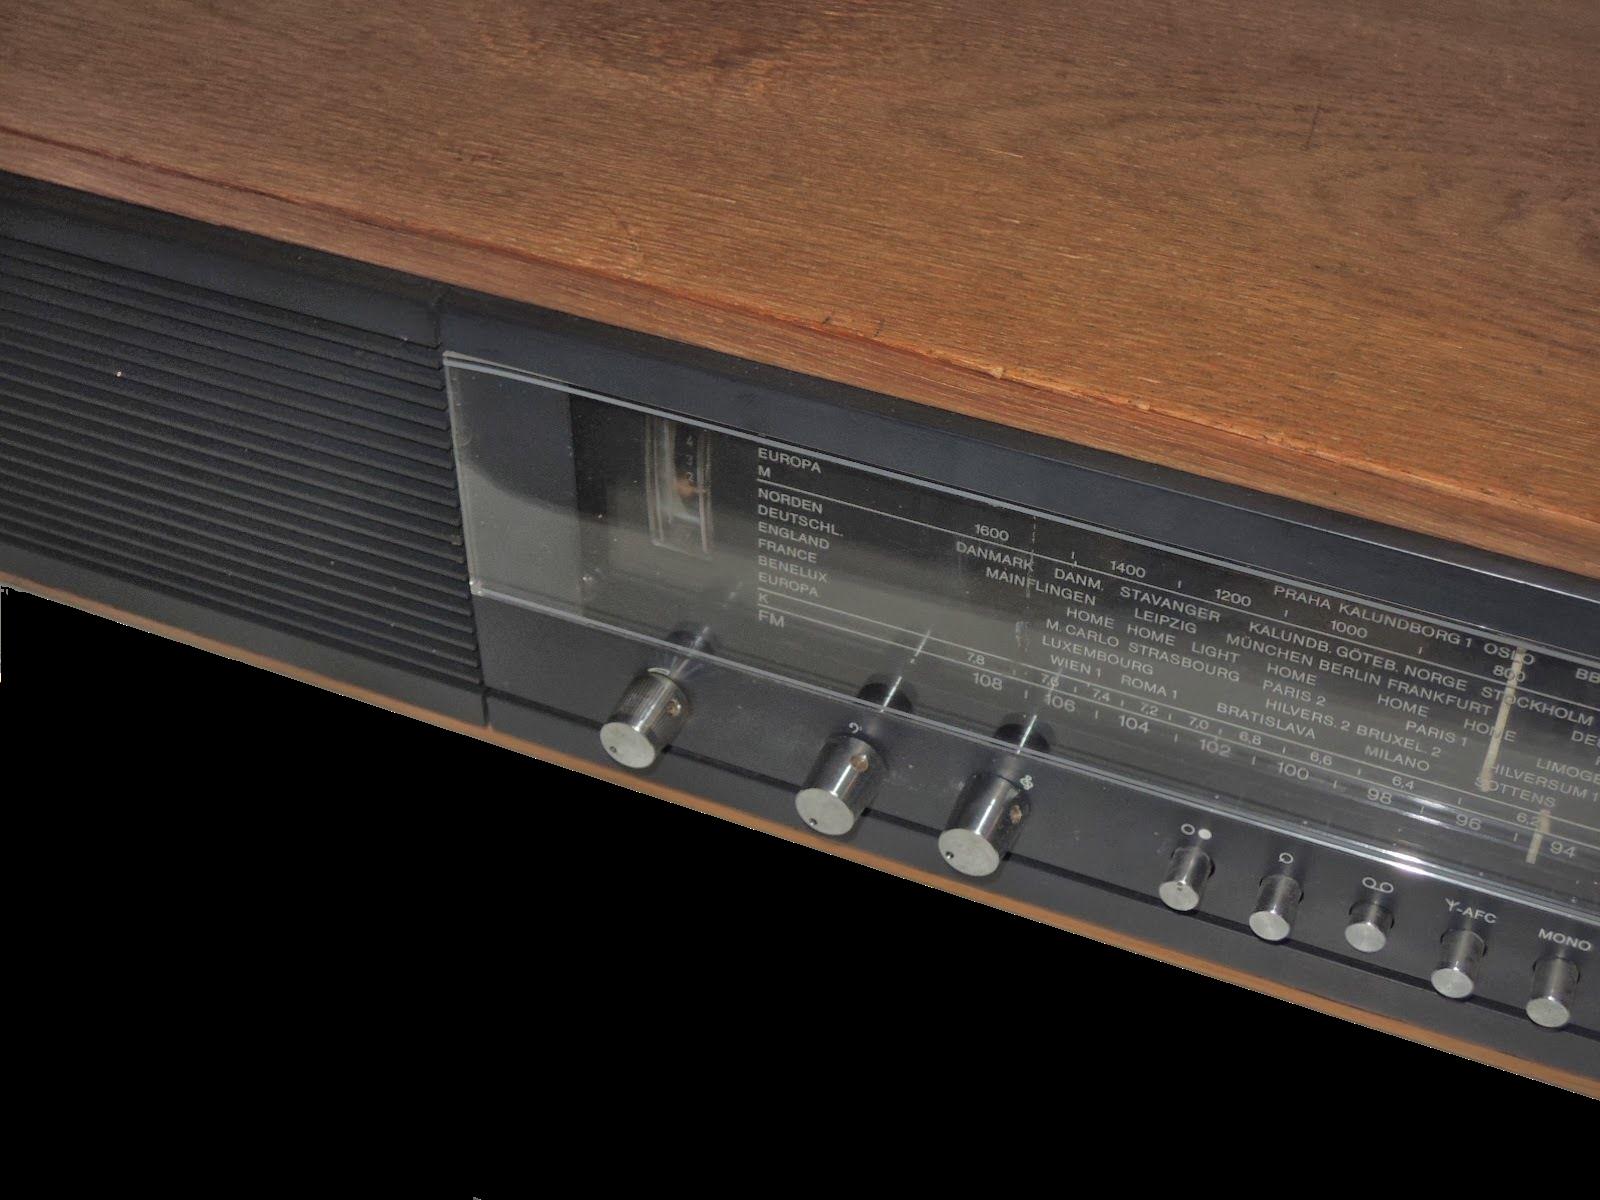 Beomaster 900K Type 2232 radioexperto.com